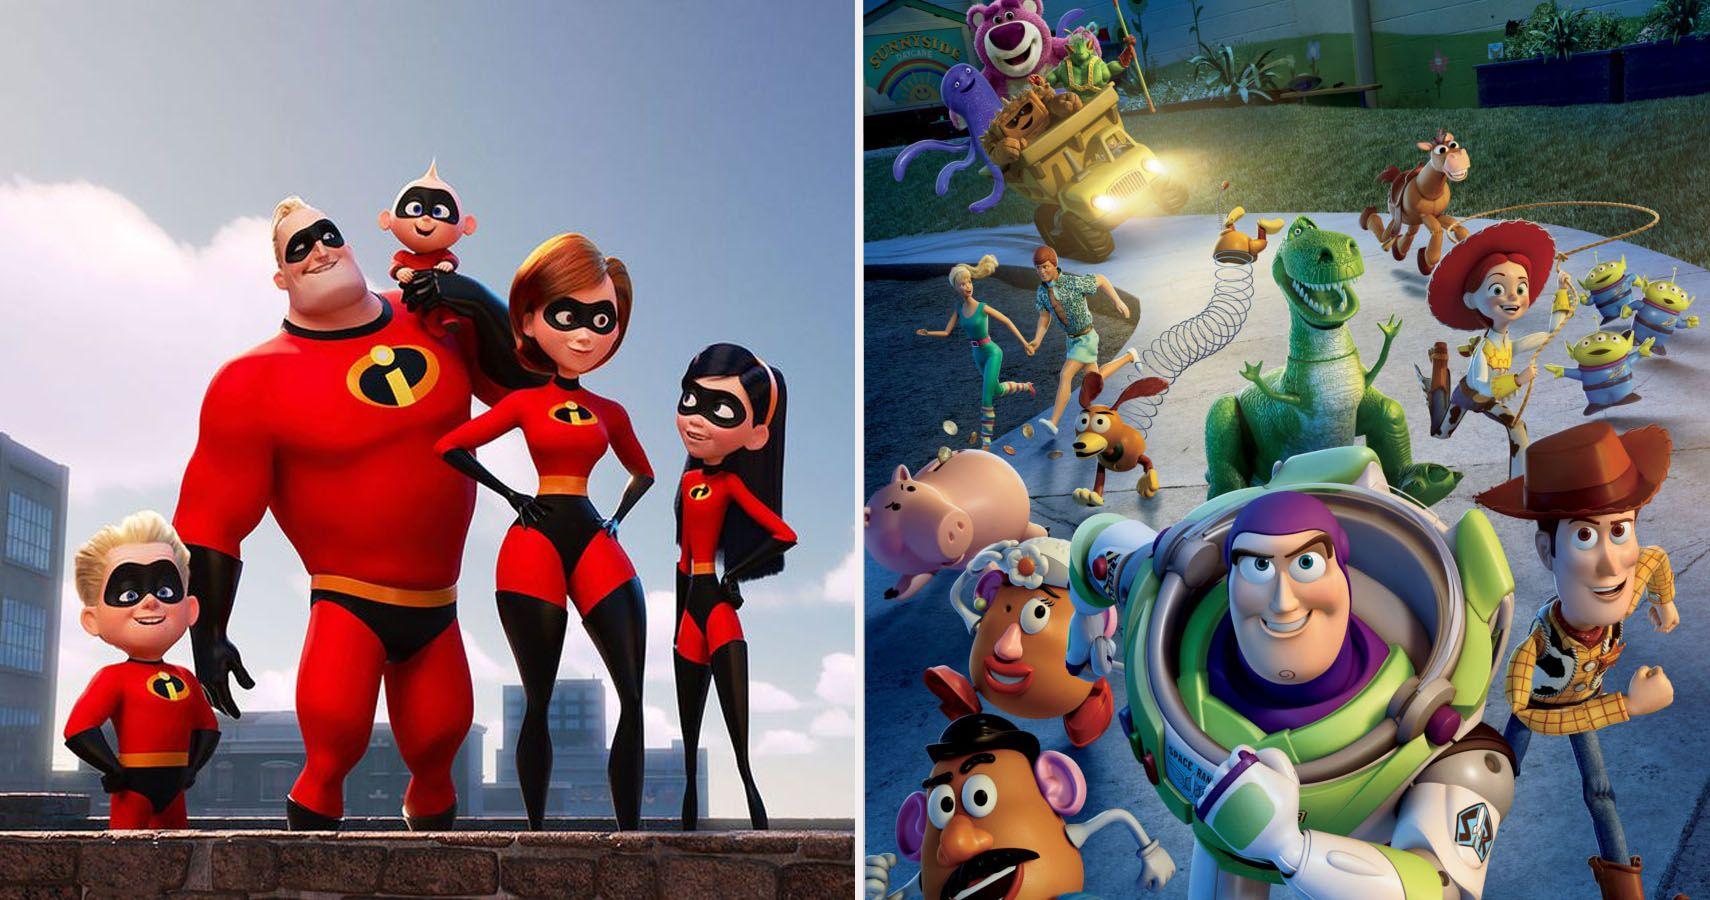 disney animated movies grossing highest films peliculas animadas ever feature imagenes screenrant